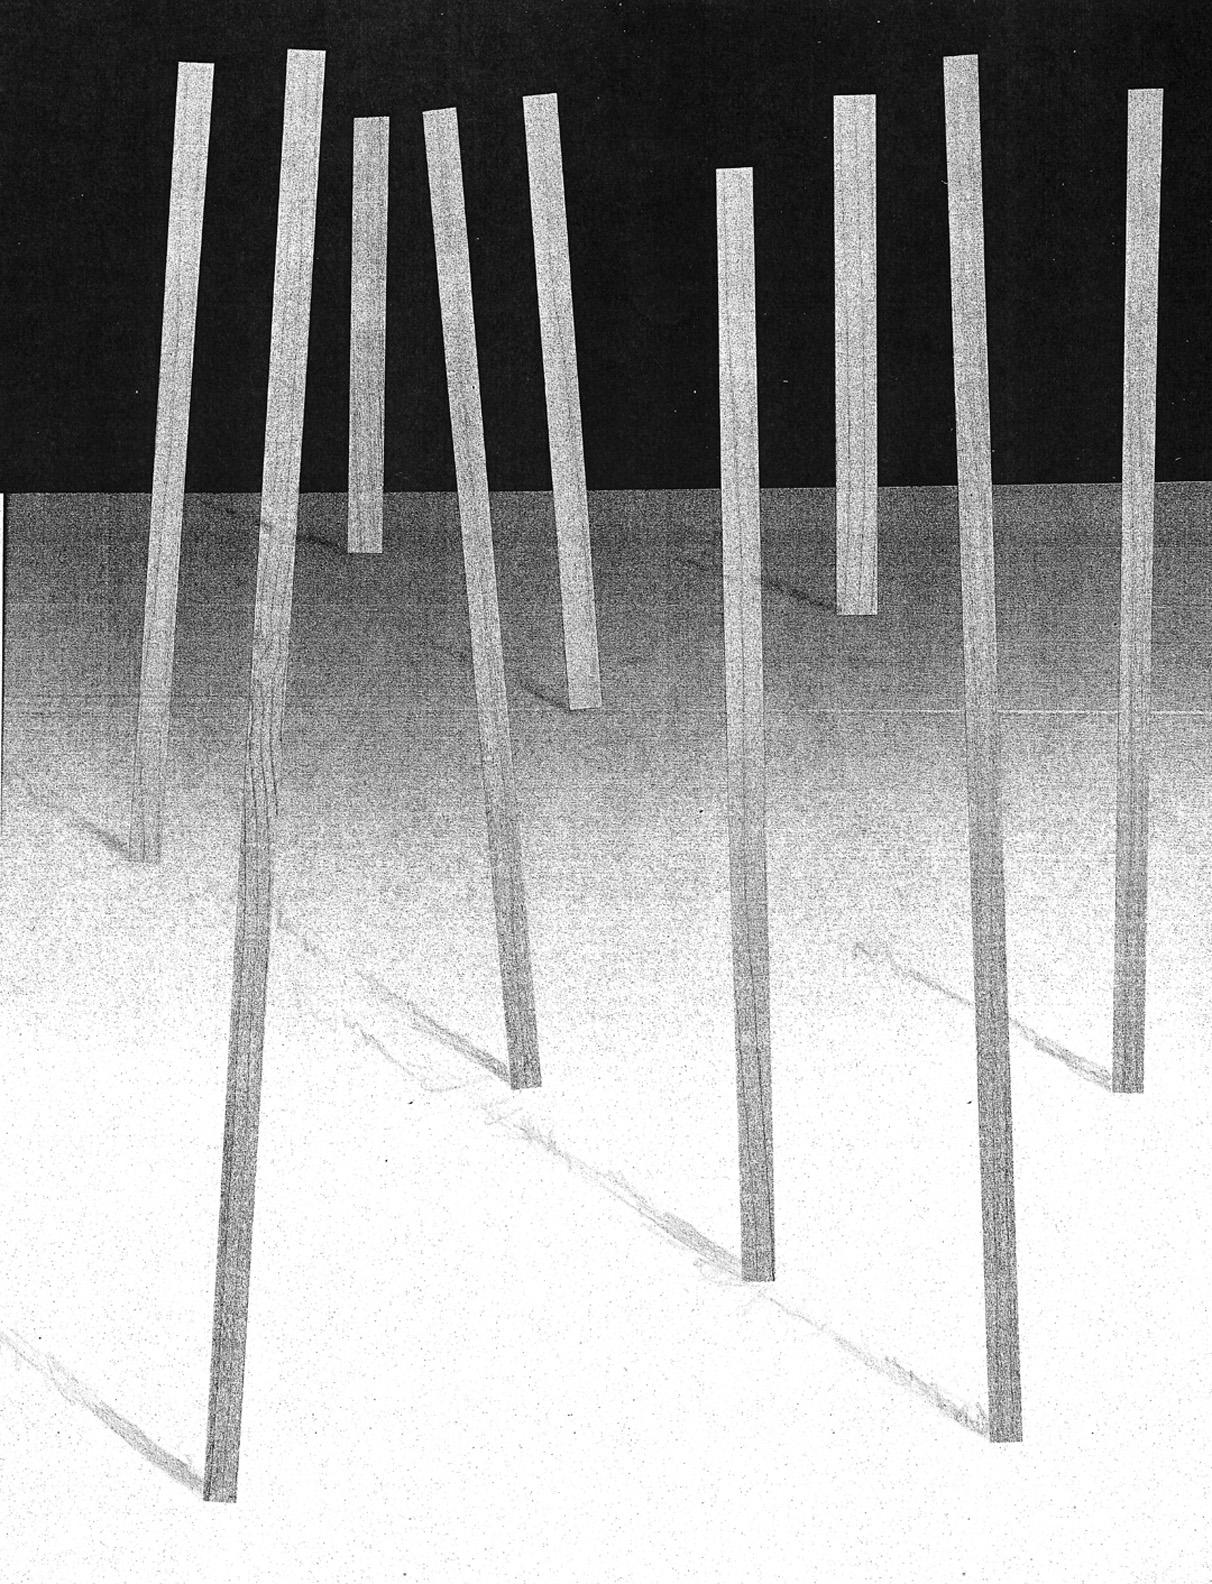 stretcher_bars_with_shadows_200.jpg